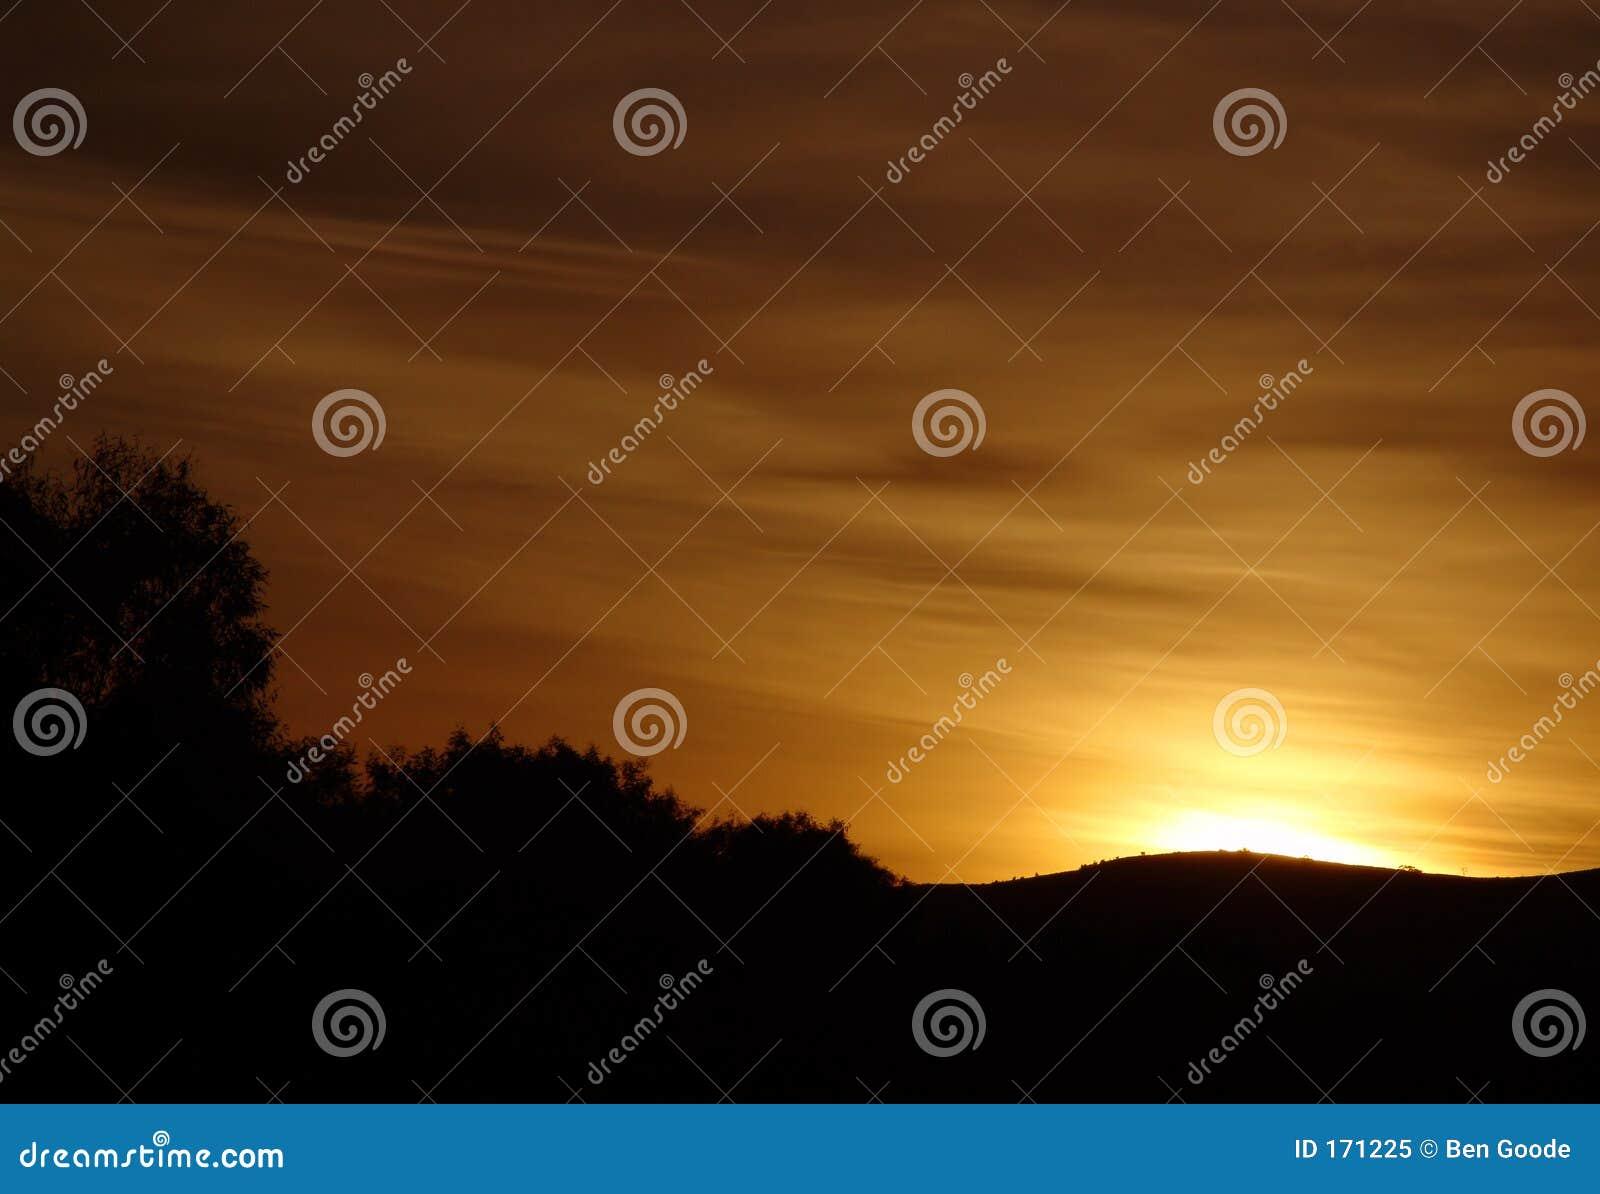 сценарный восход солнца